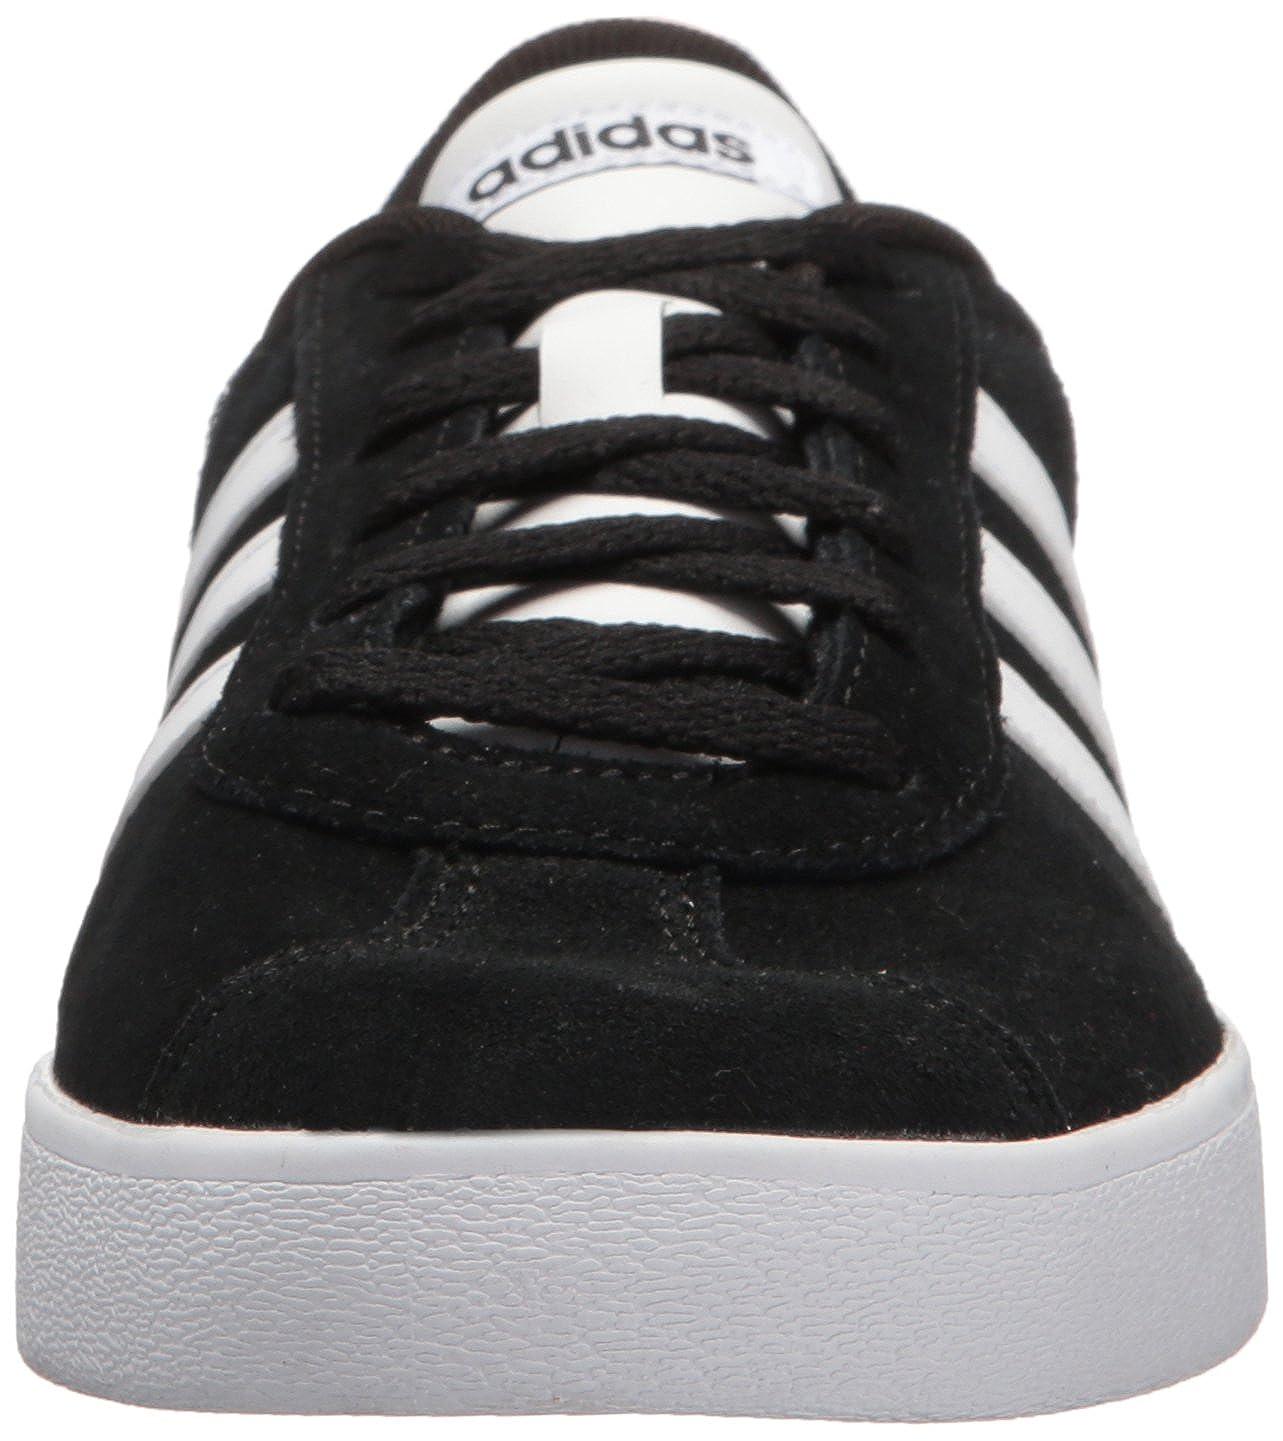 caf473e0363 adidas Kids VL Court 2.0 Core Black White Core Black 4 M US Little Kid  DB1827